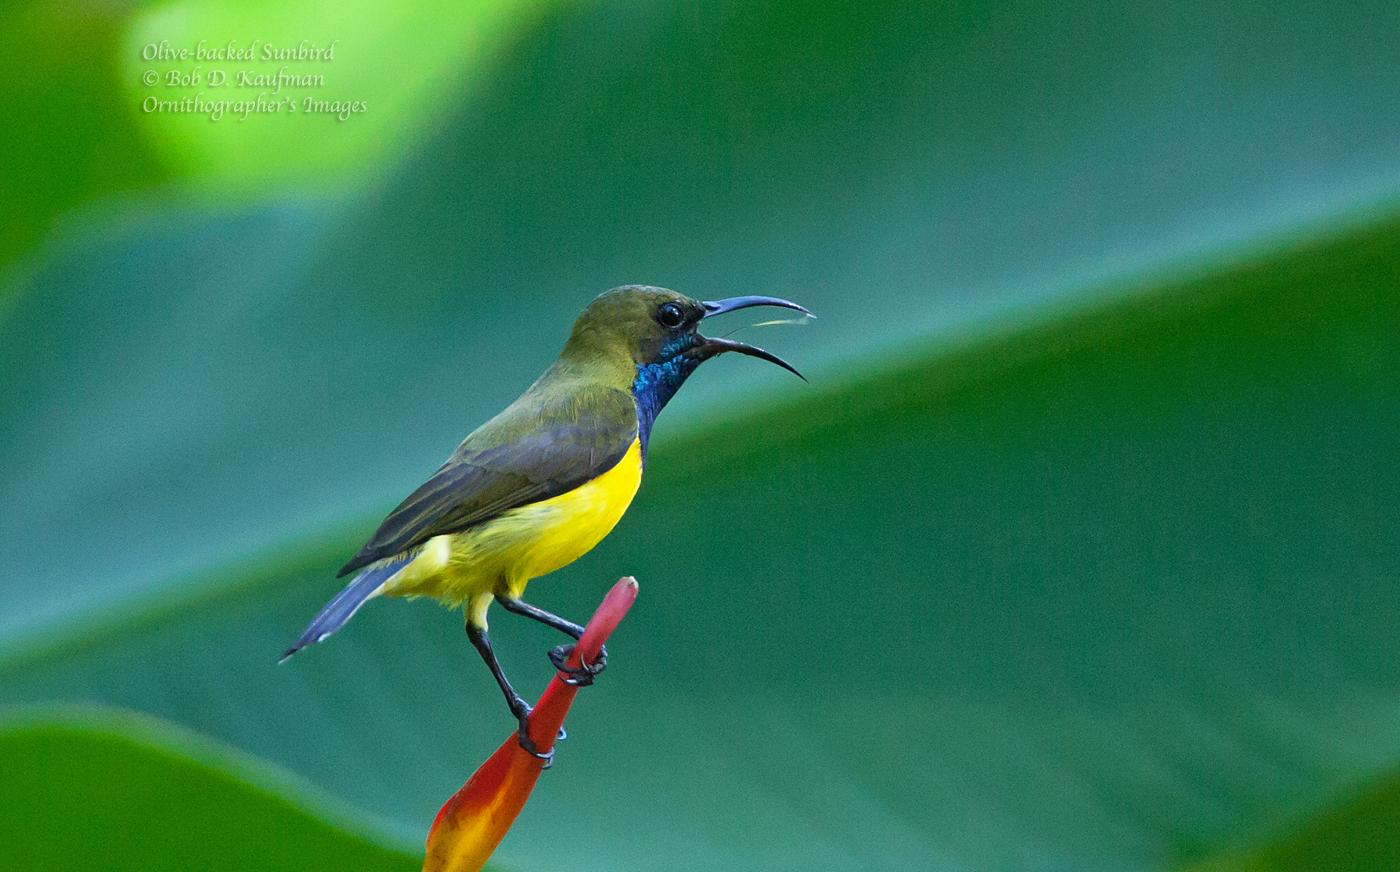 Wonderful wildlife: Birds and bees